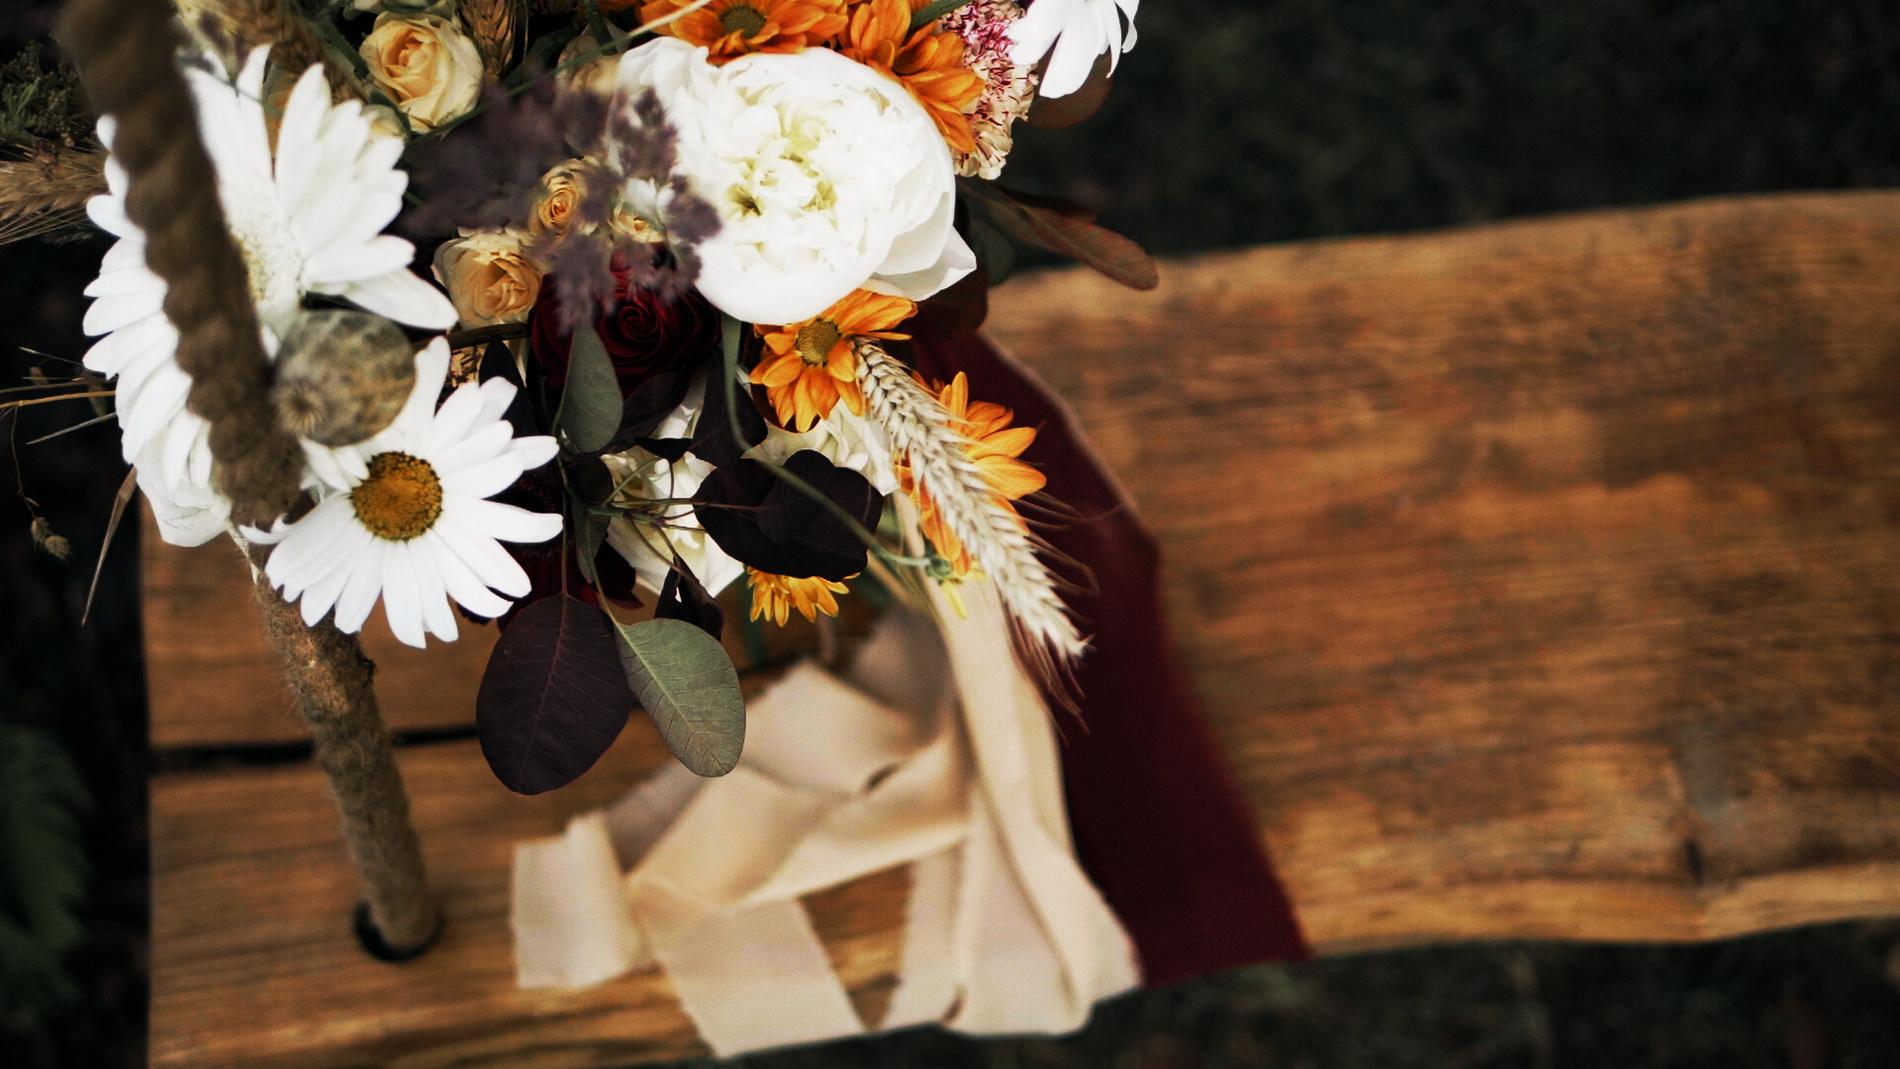 wedding_editorial_art_film_portrait_videographer_sesja_slubna_stylizowana_boho_filmowca_teledysk_slubny 02 (12).jpg